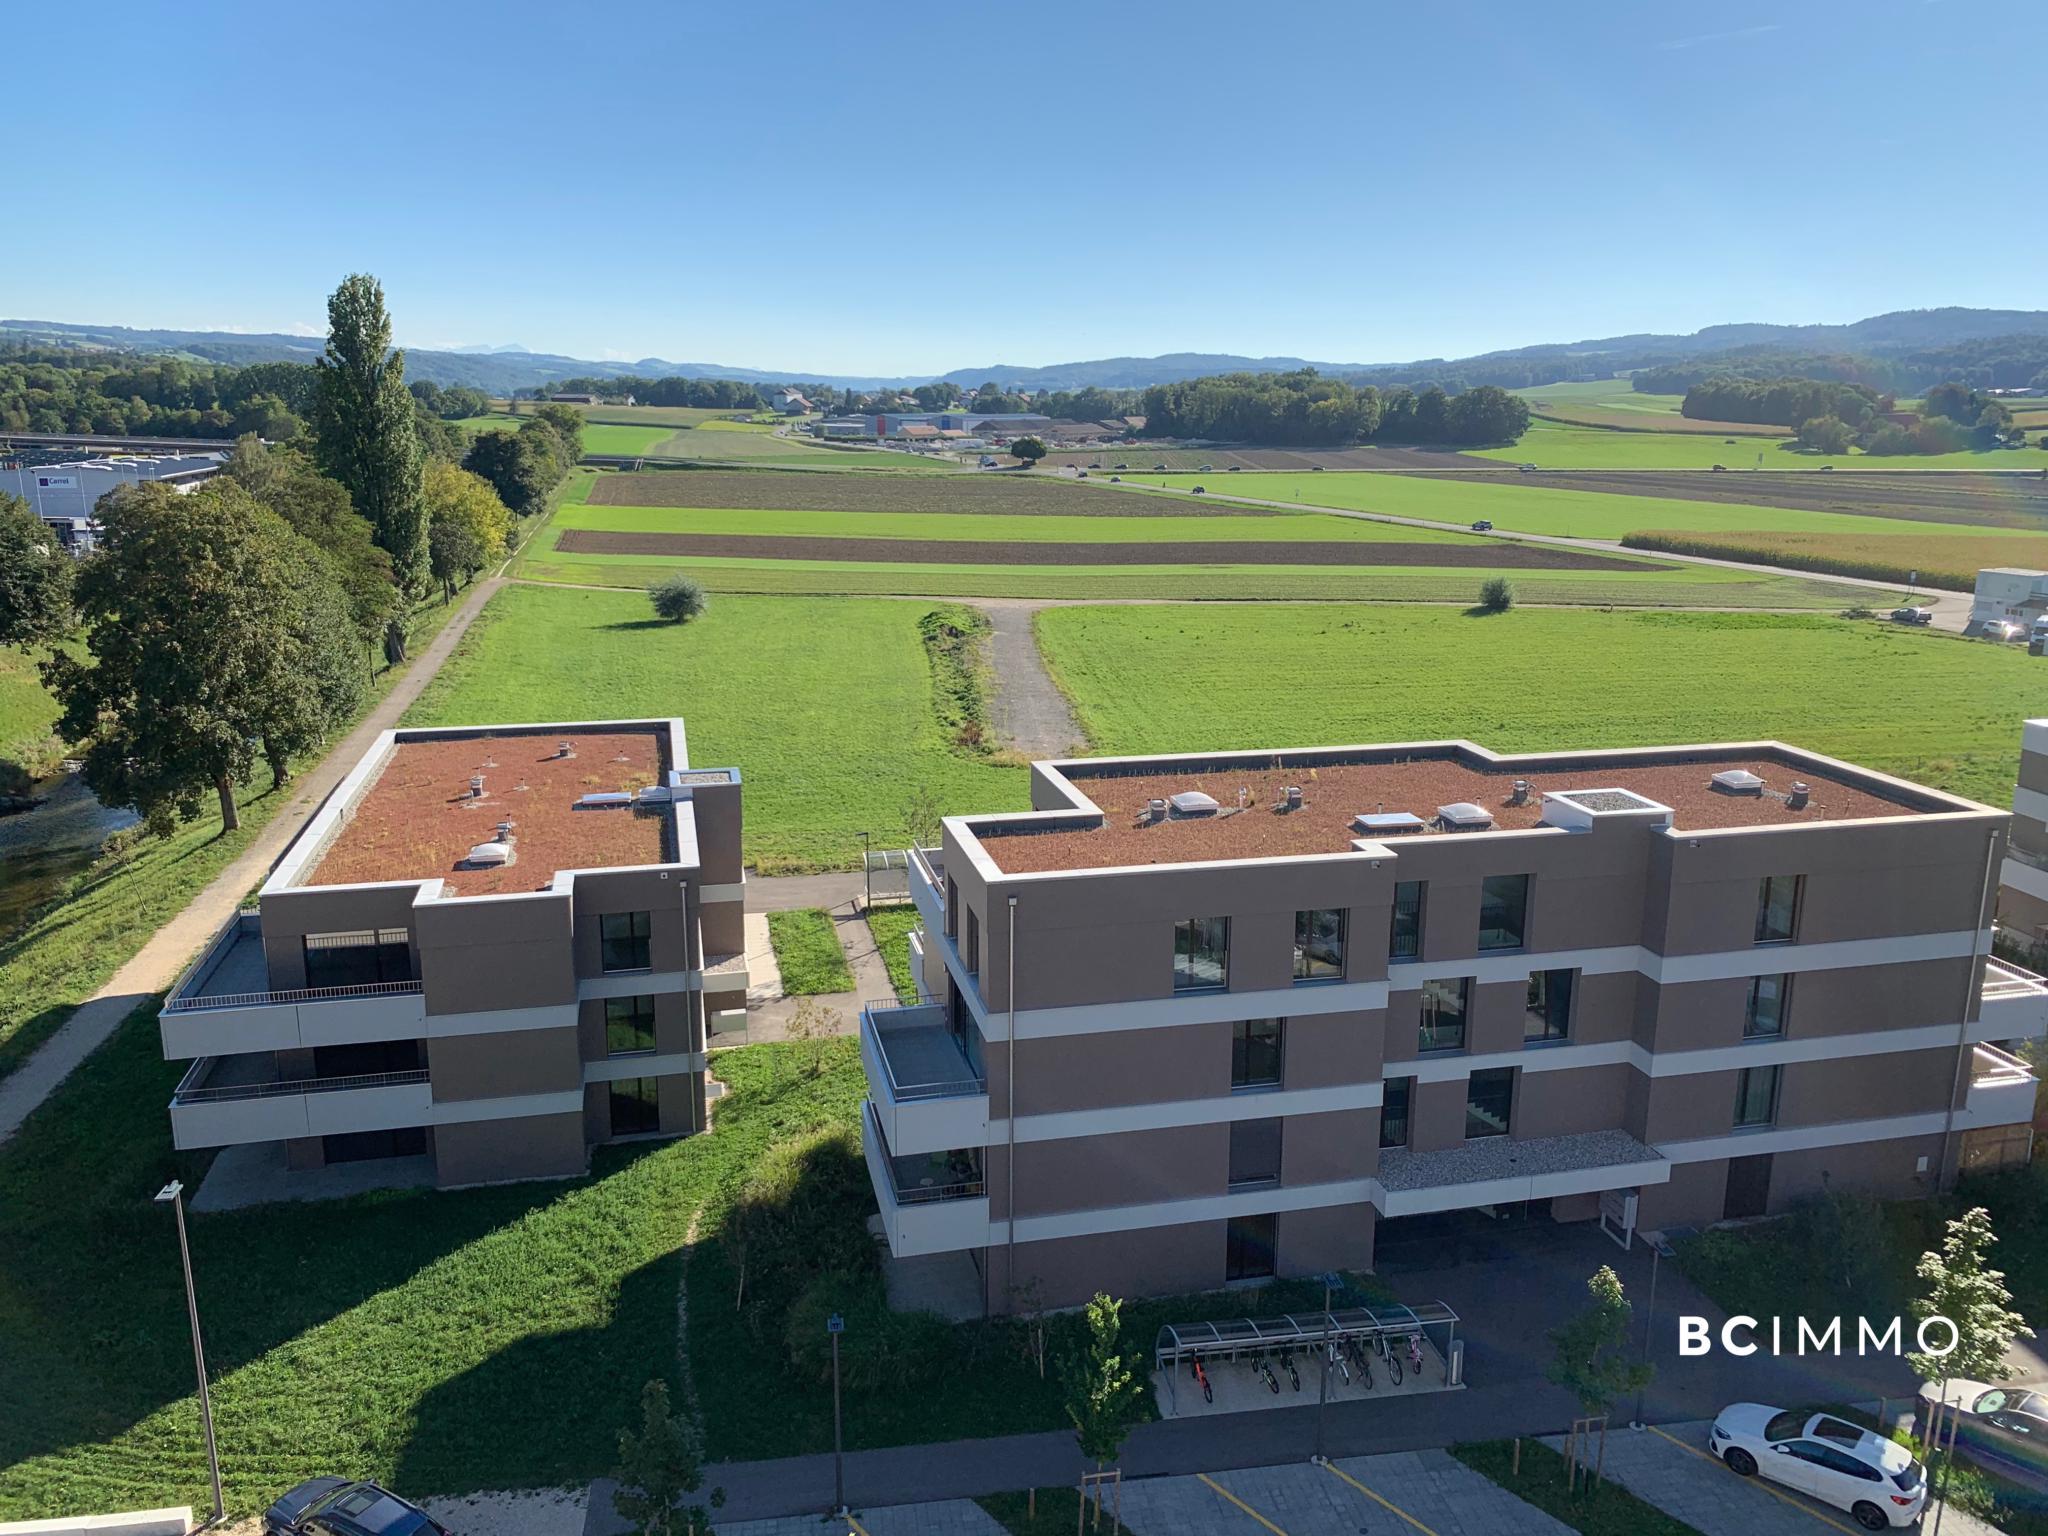 BC Immo - Spacieux - Grandes terrasses - Au calme - CELLA-1-09